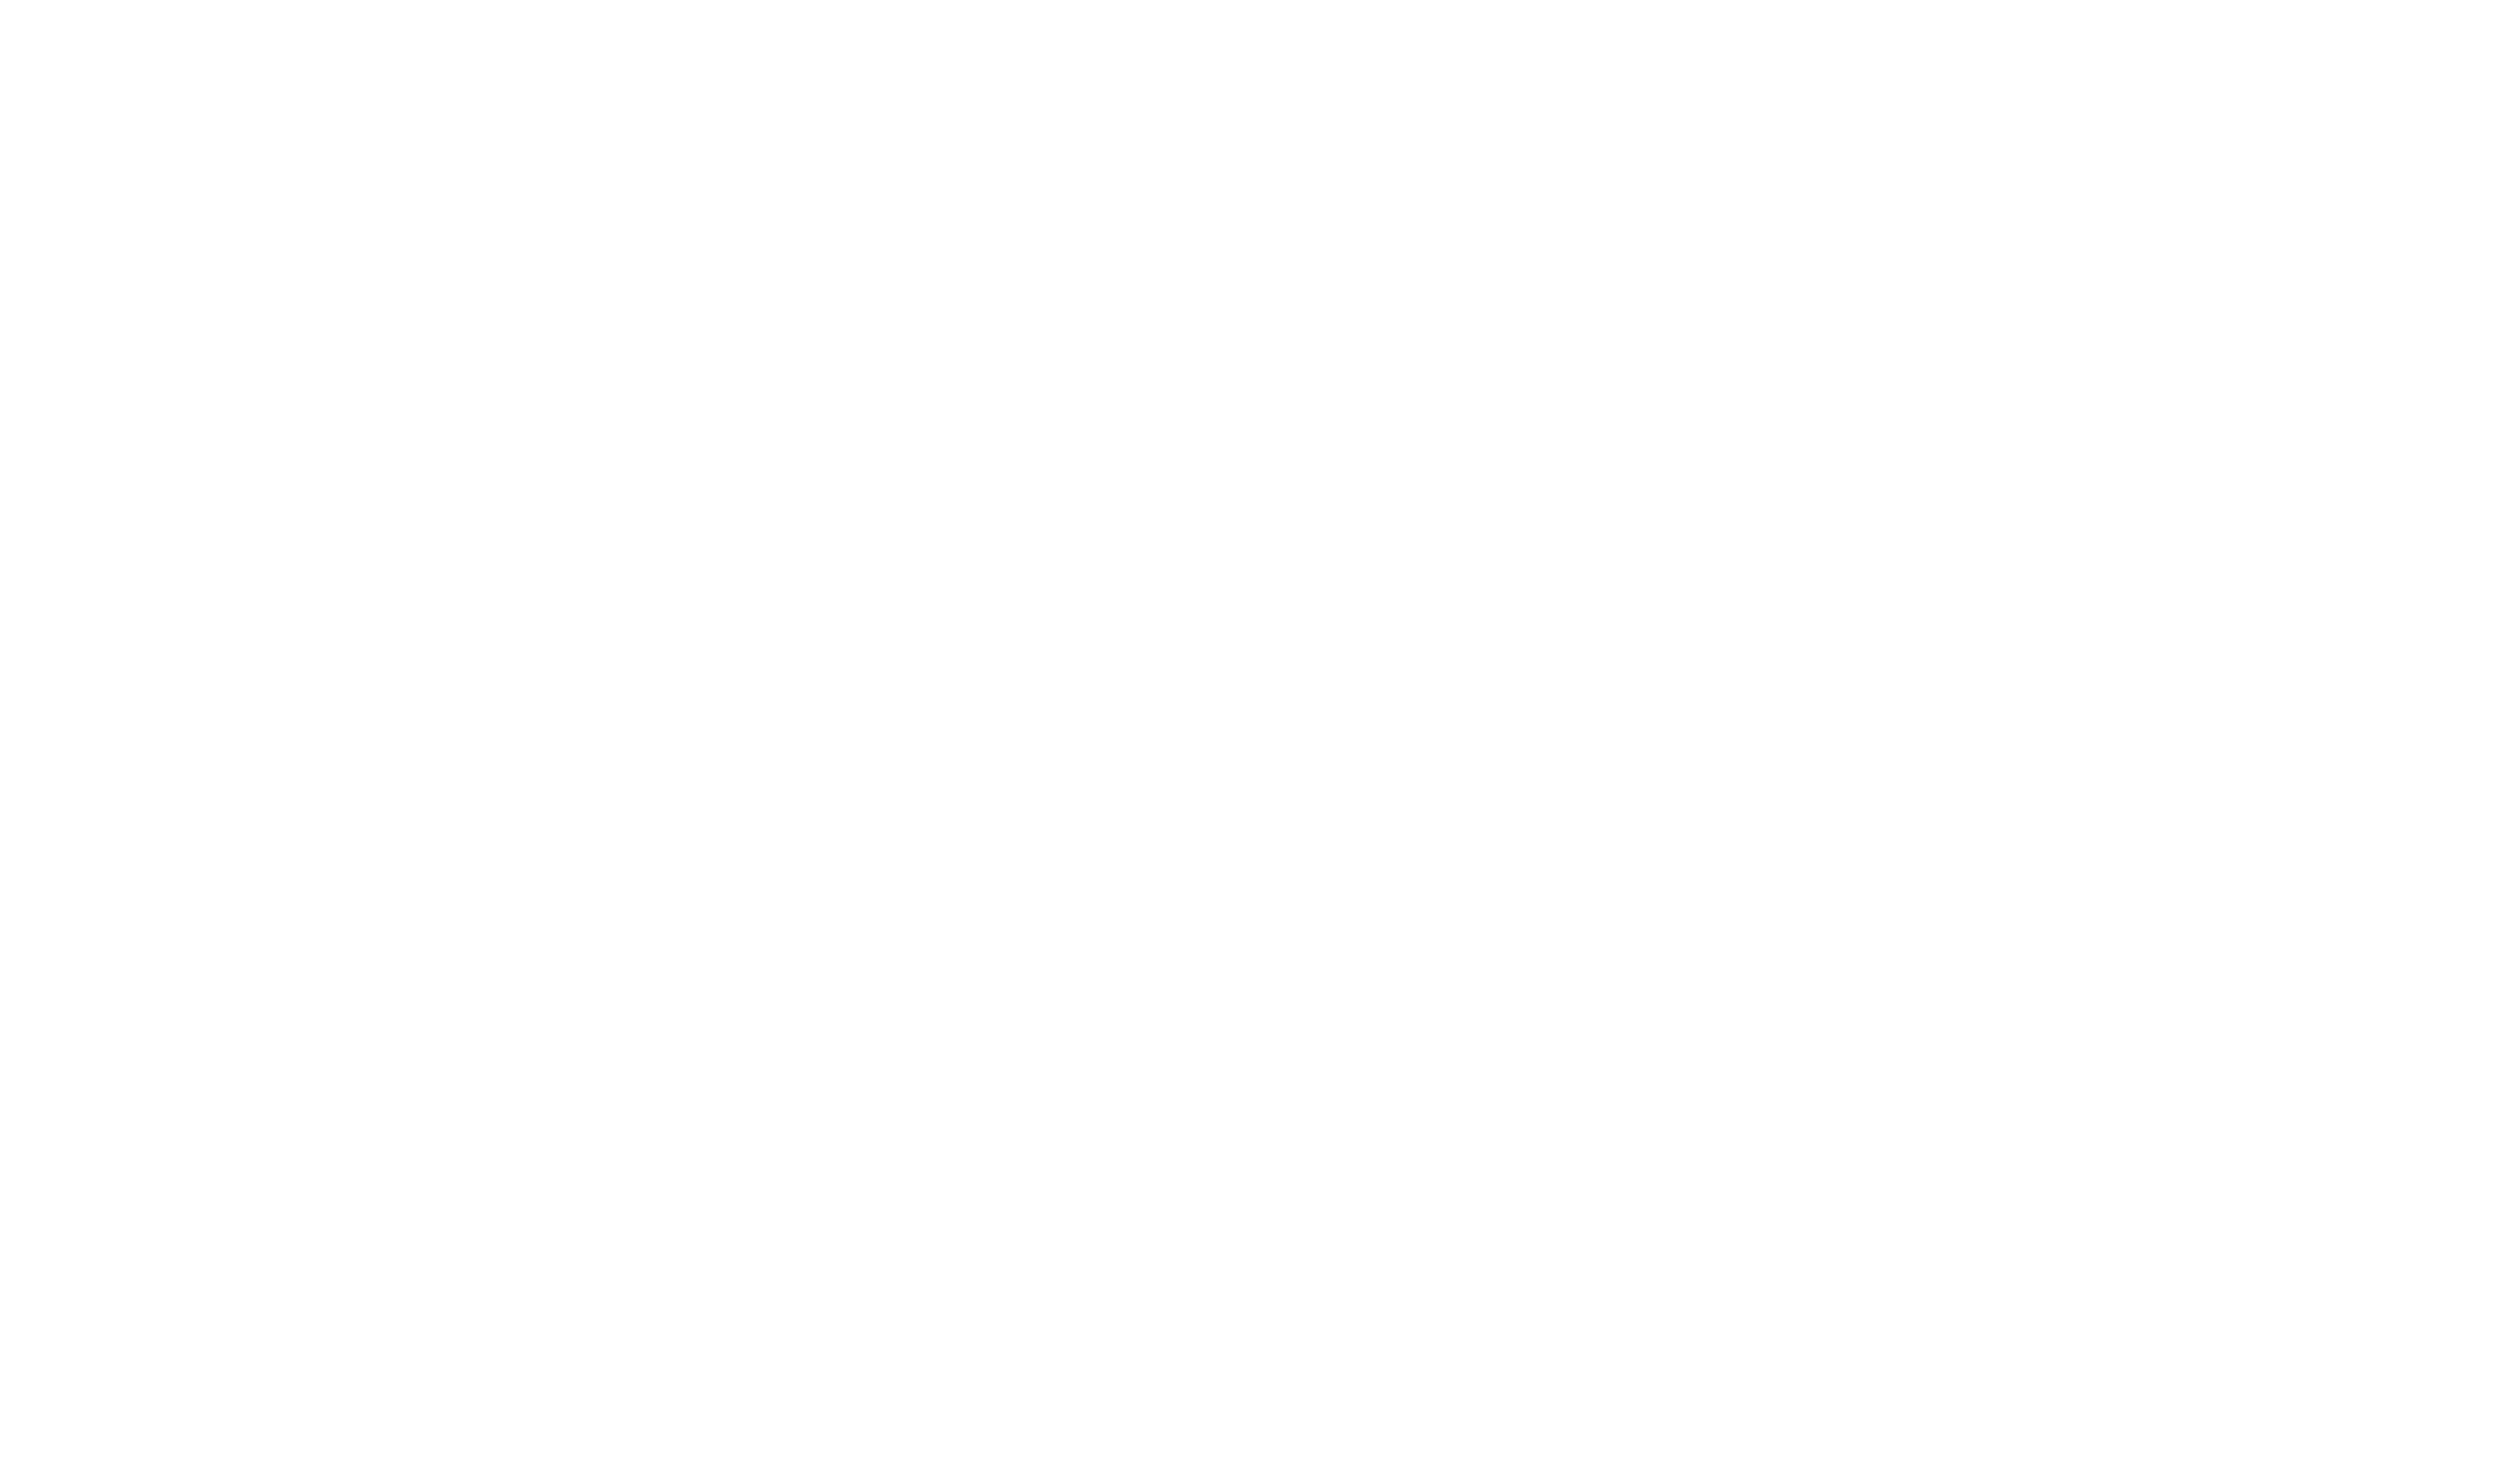 German_Design_Award_Nominee_2018